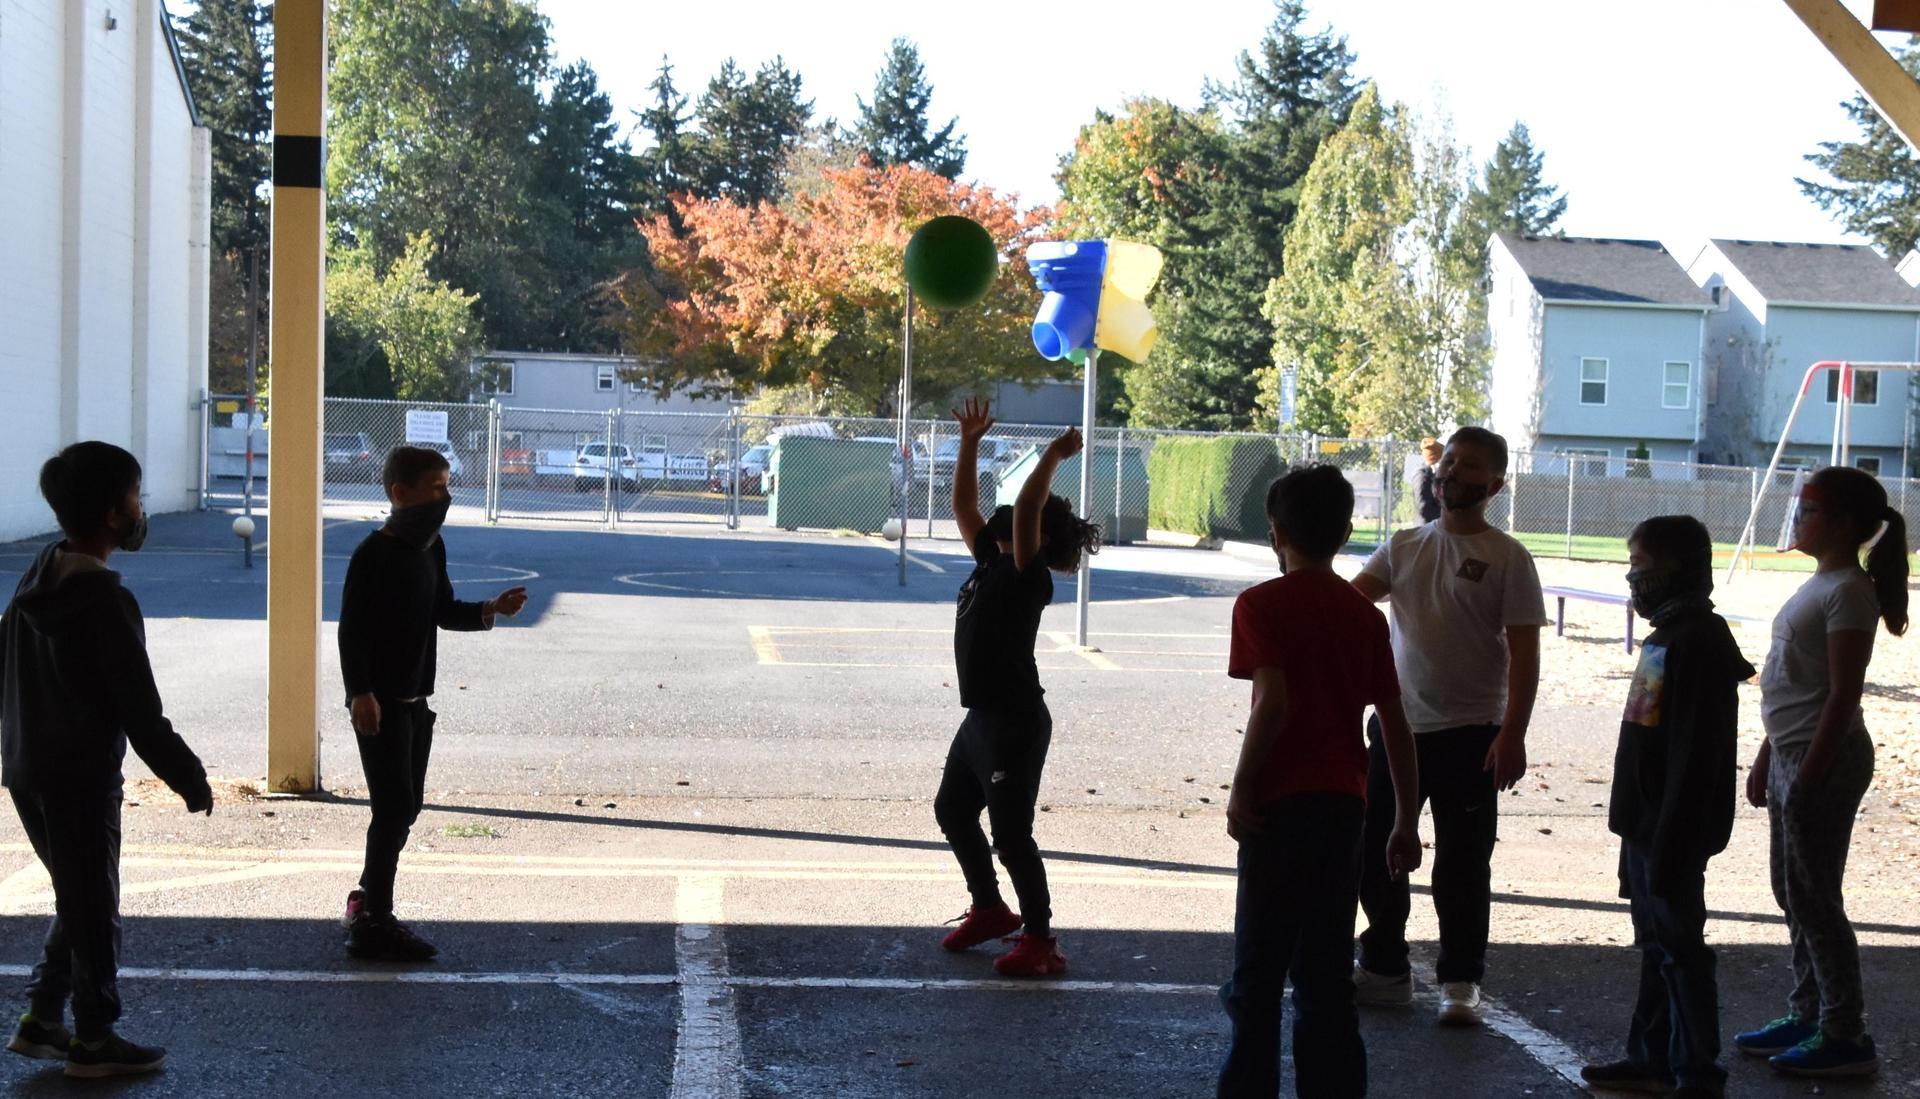 Basketball on the playground